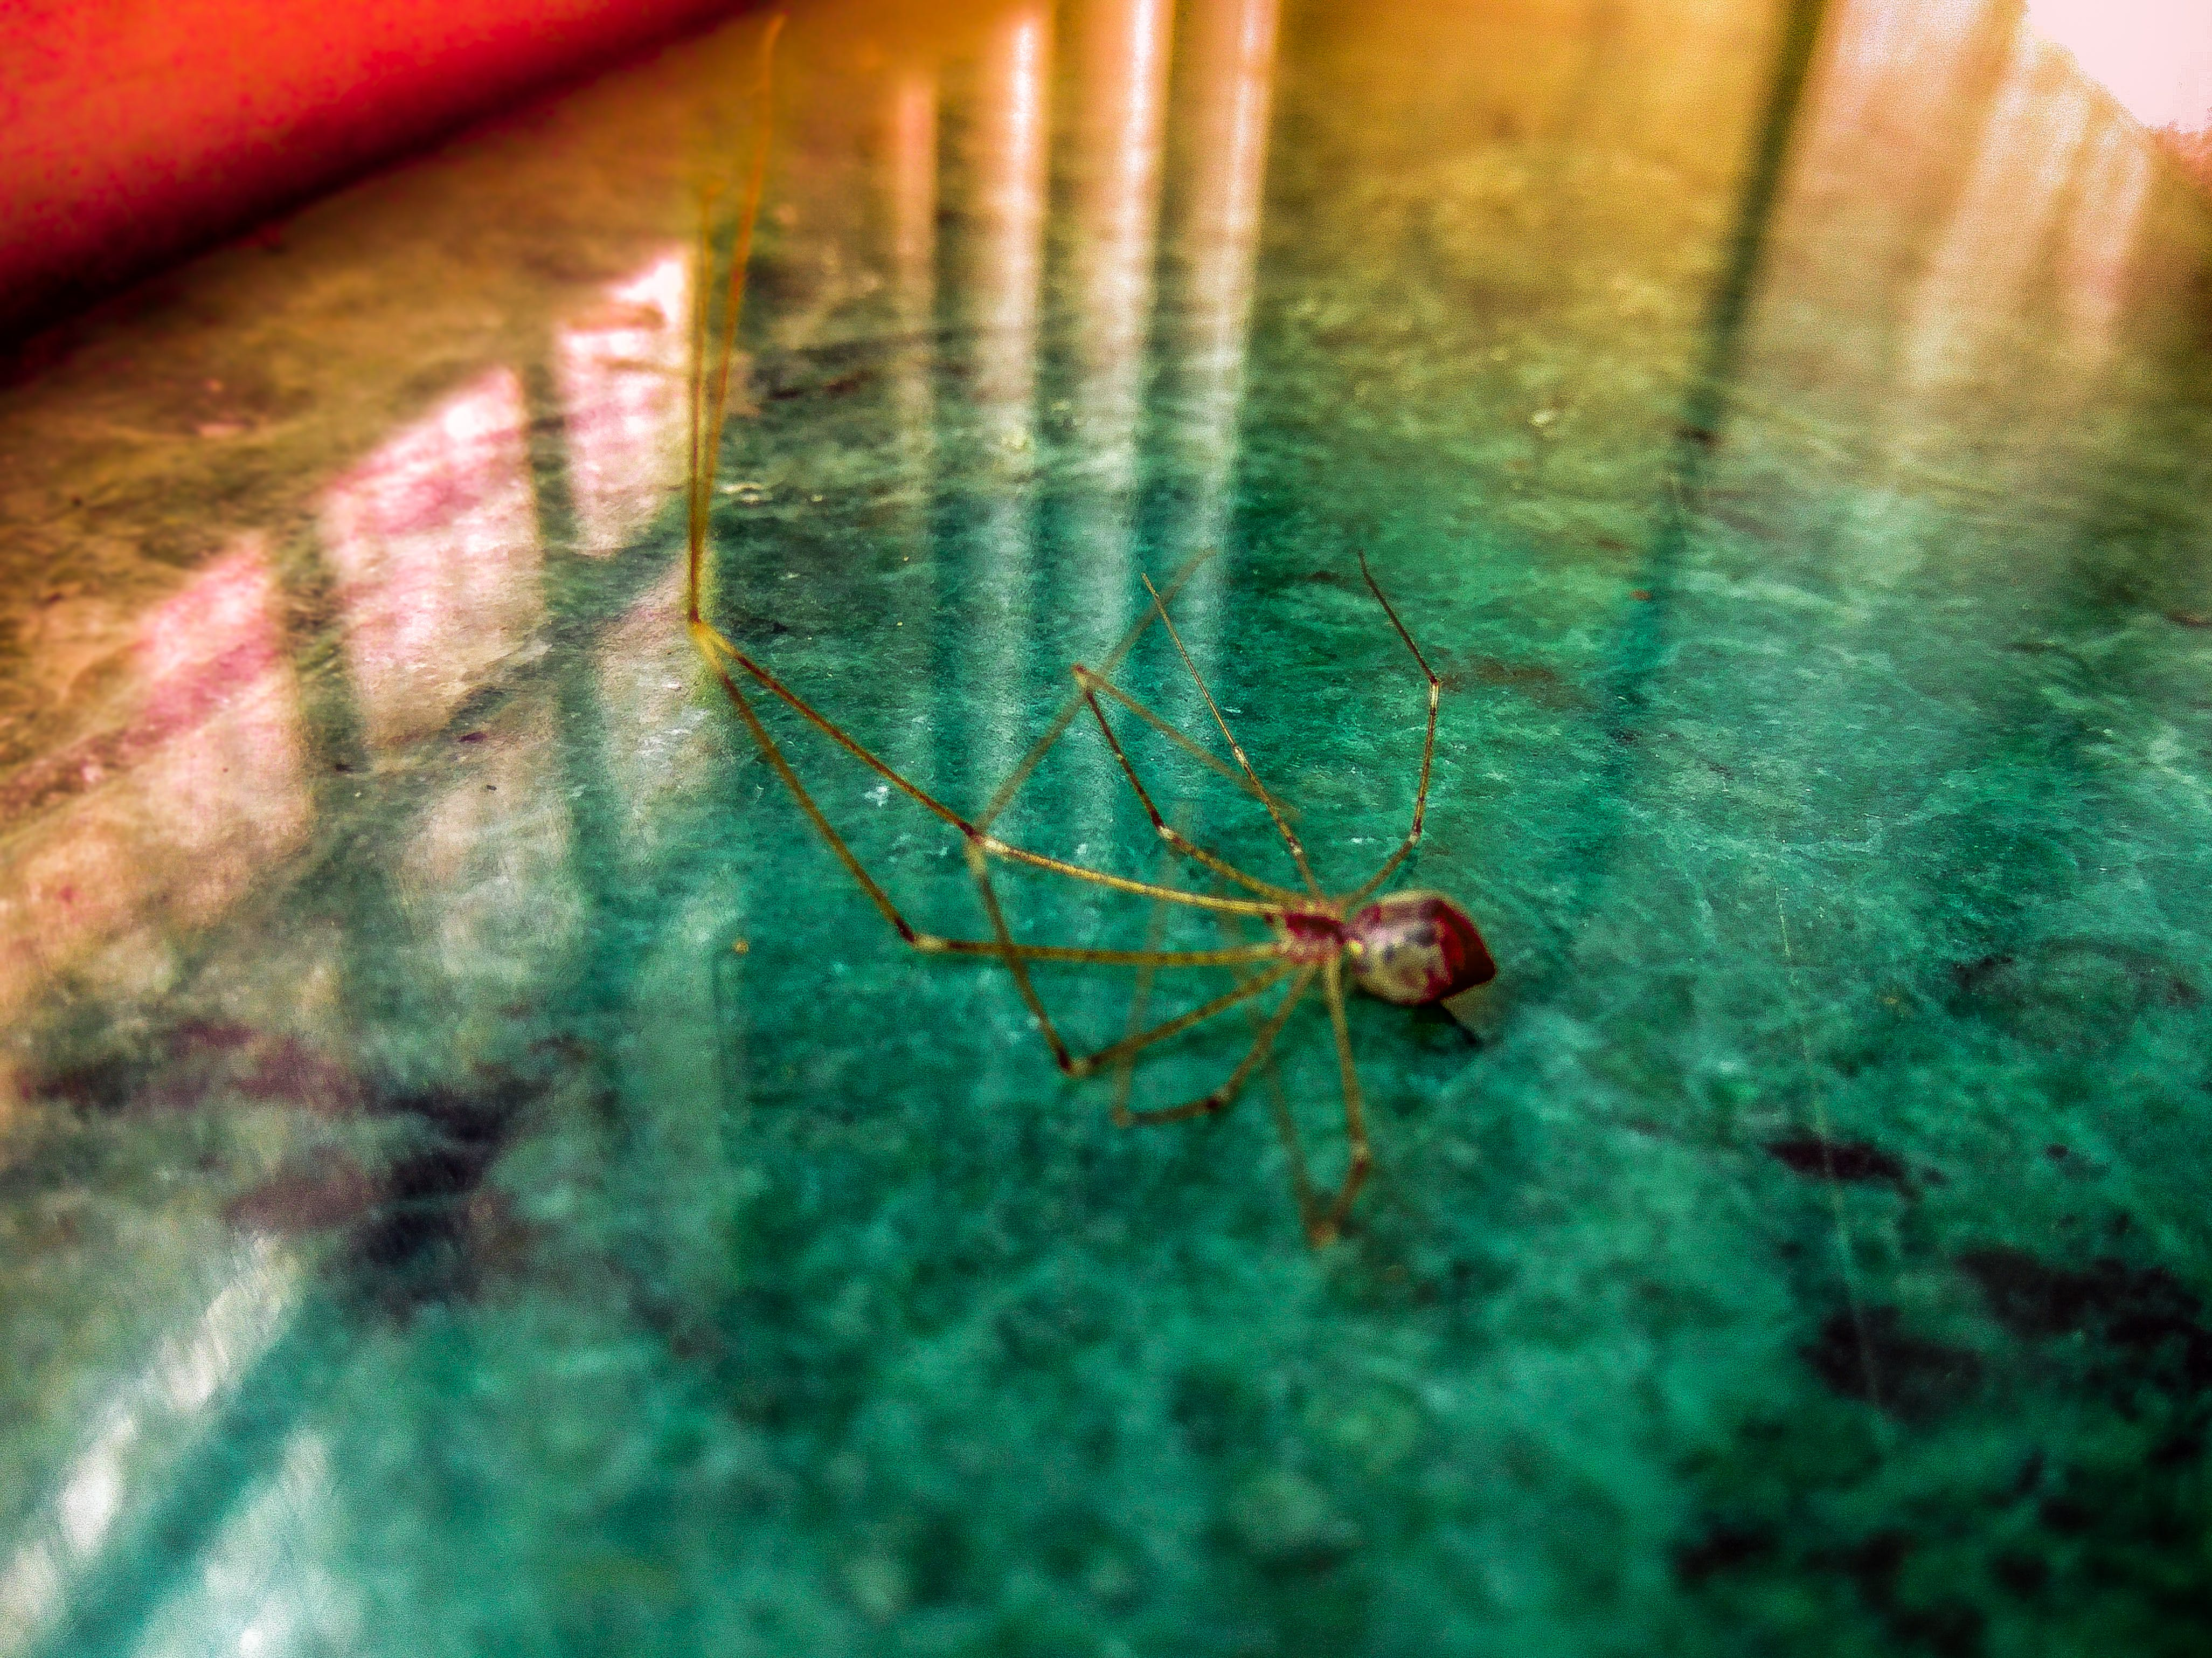 Free stock photo of #spider #rainbow #lookatthosecolors #micro #travel